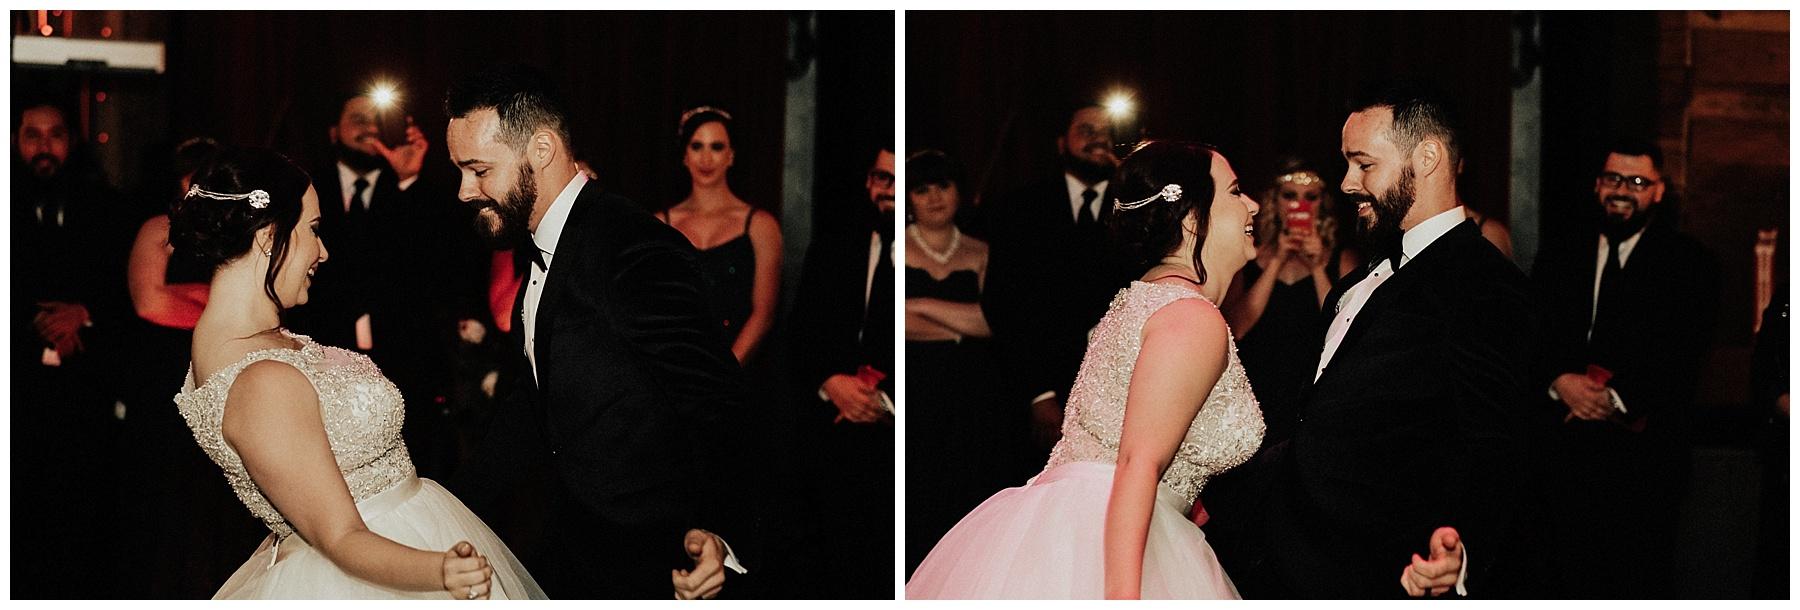 Fort Lauderdale Wedding Tampa Wedding Photographer-143.jpg